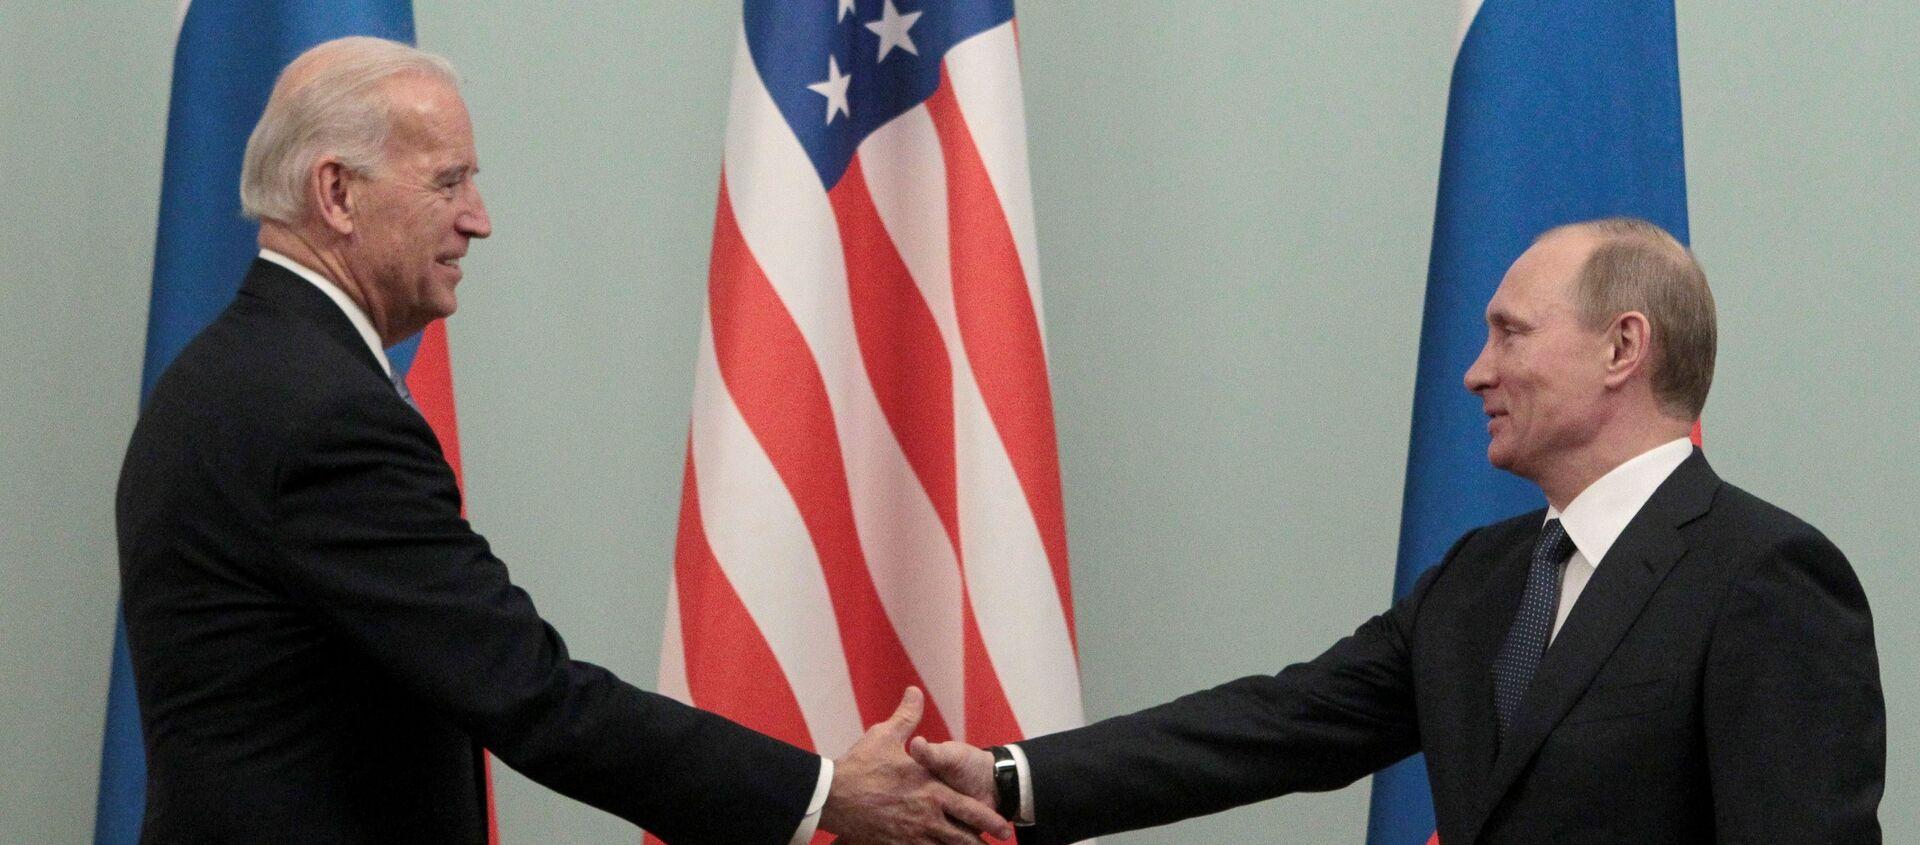 Joe Biden i Władimir Putin, 10 marca 2011 rok - Sputnik Polska, 1920, 11.06.2021